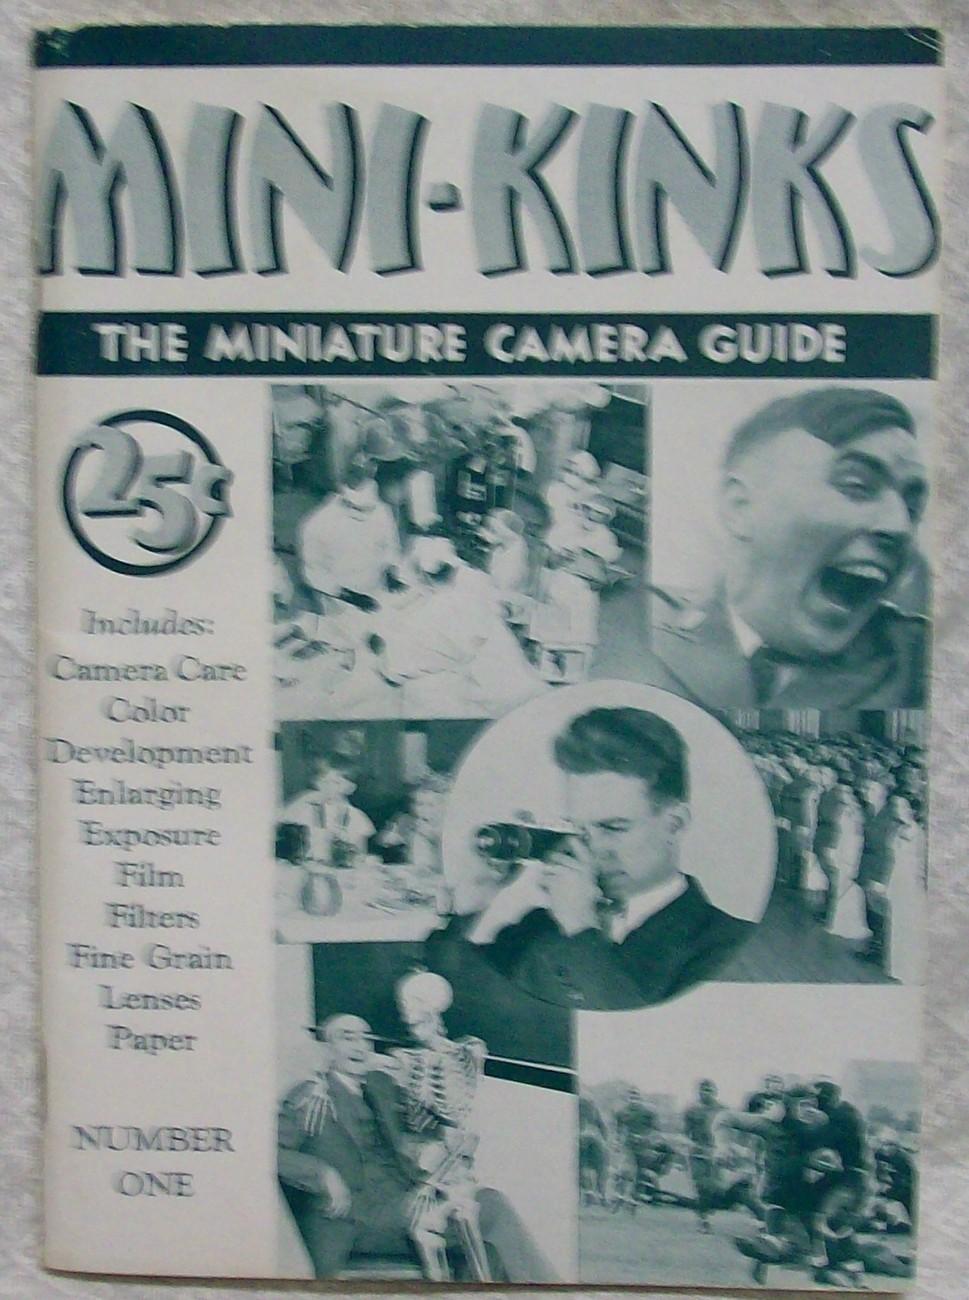 Minikinks